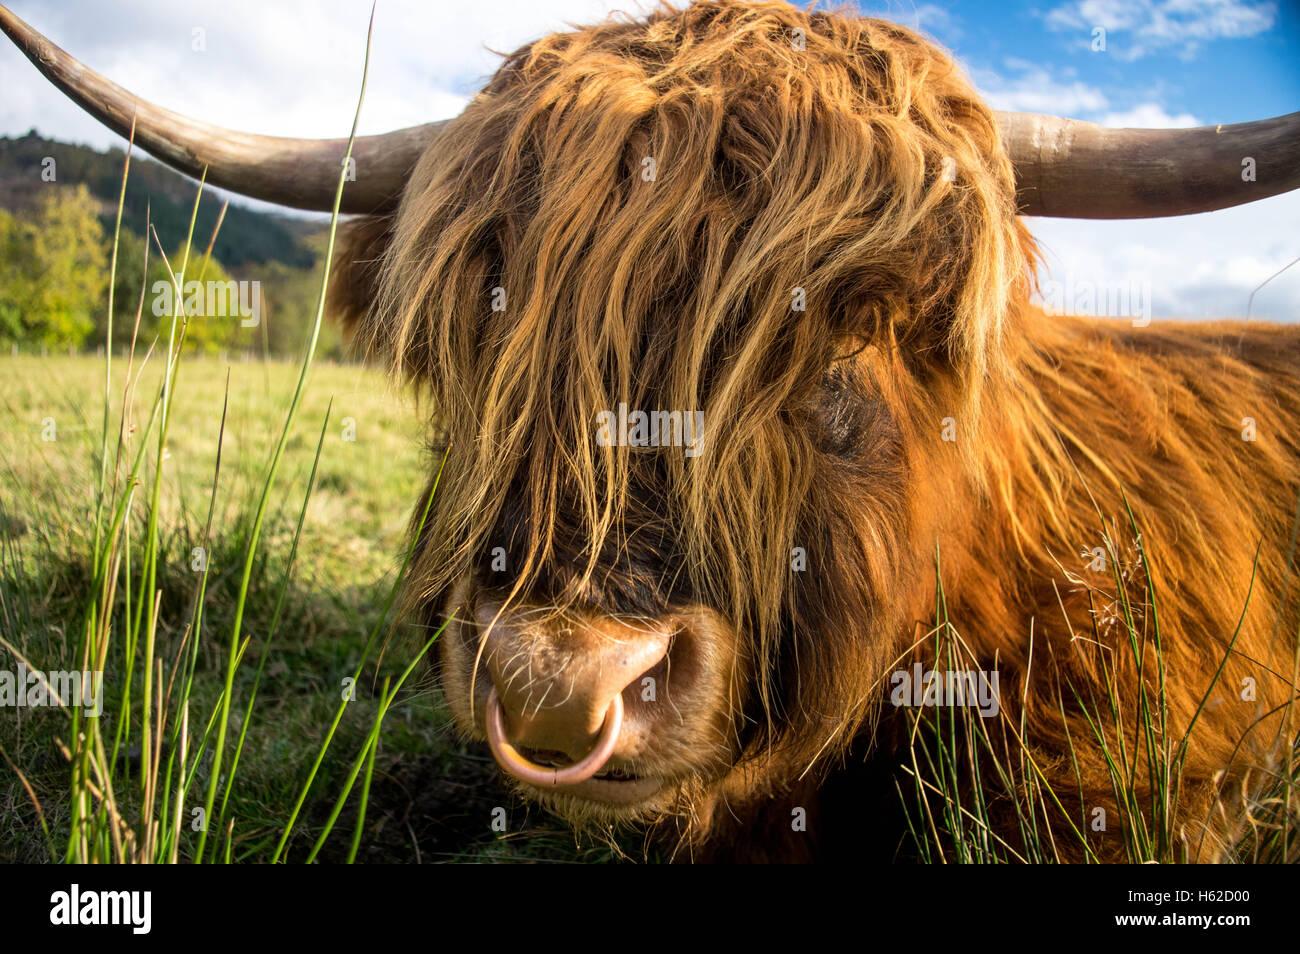 Highland Cow, the Trossachs, Scotland - Stock Image